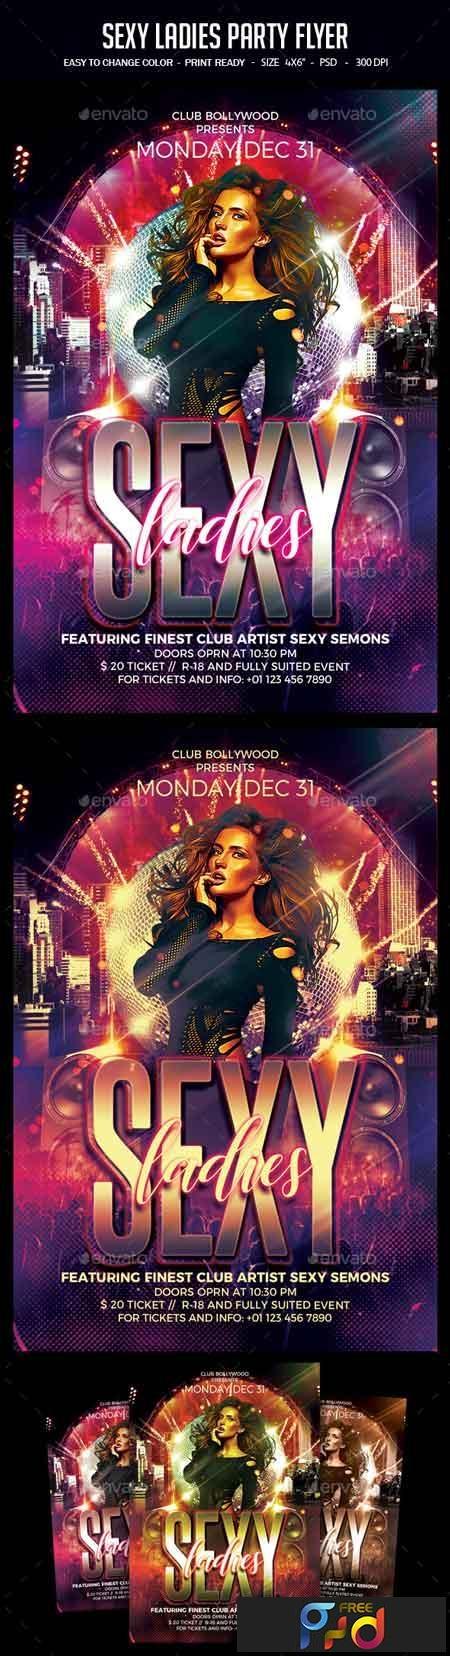 Sexy Ladies Party Flyer 22757843 1